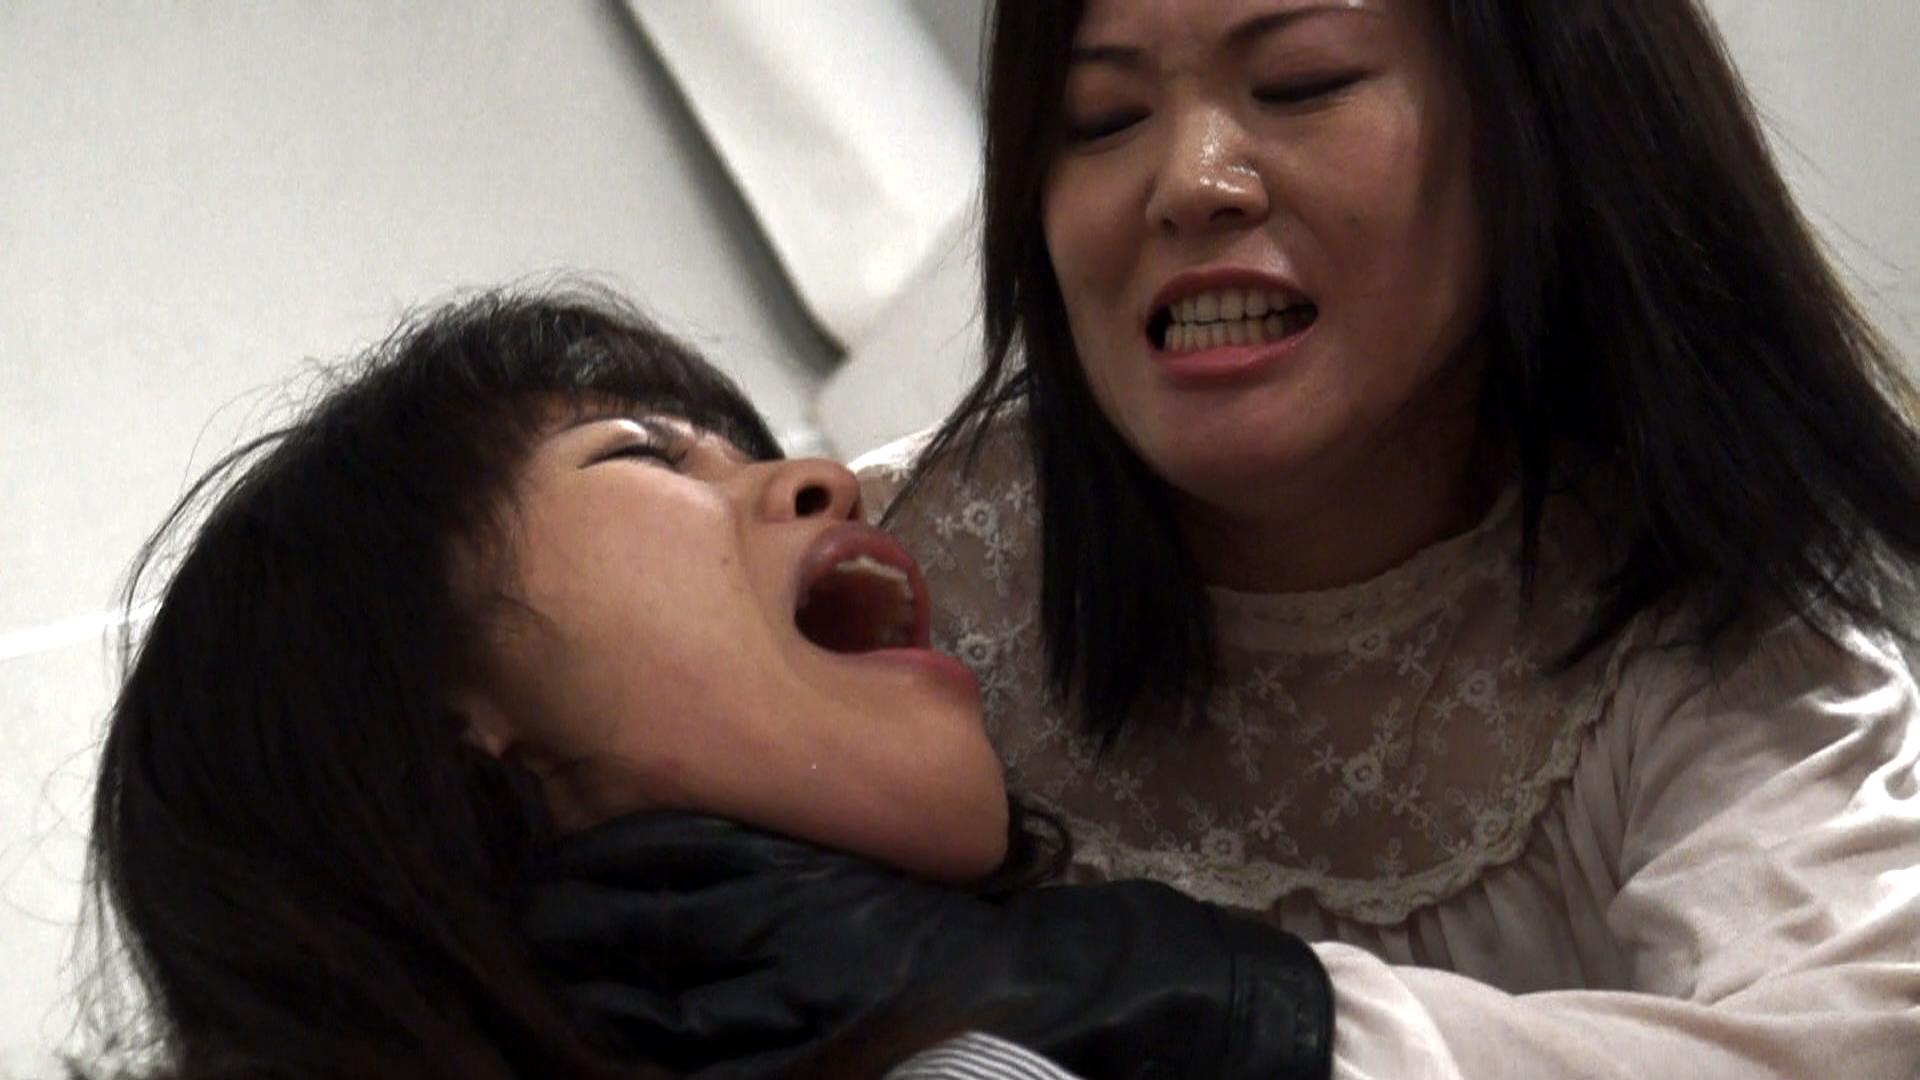 【HD】黒革手袋のレズビアン首絞め淫辱百合責め 2 サンプル画像05